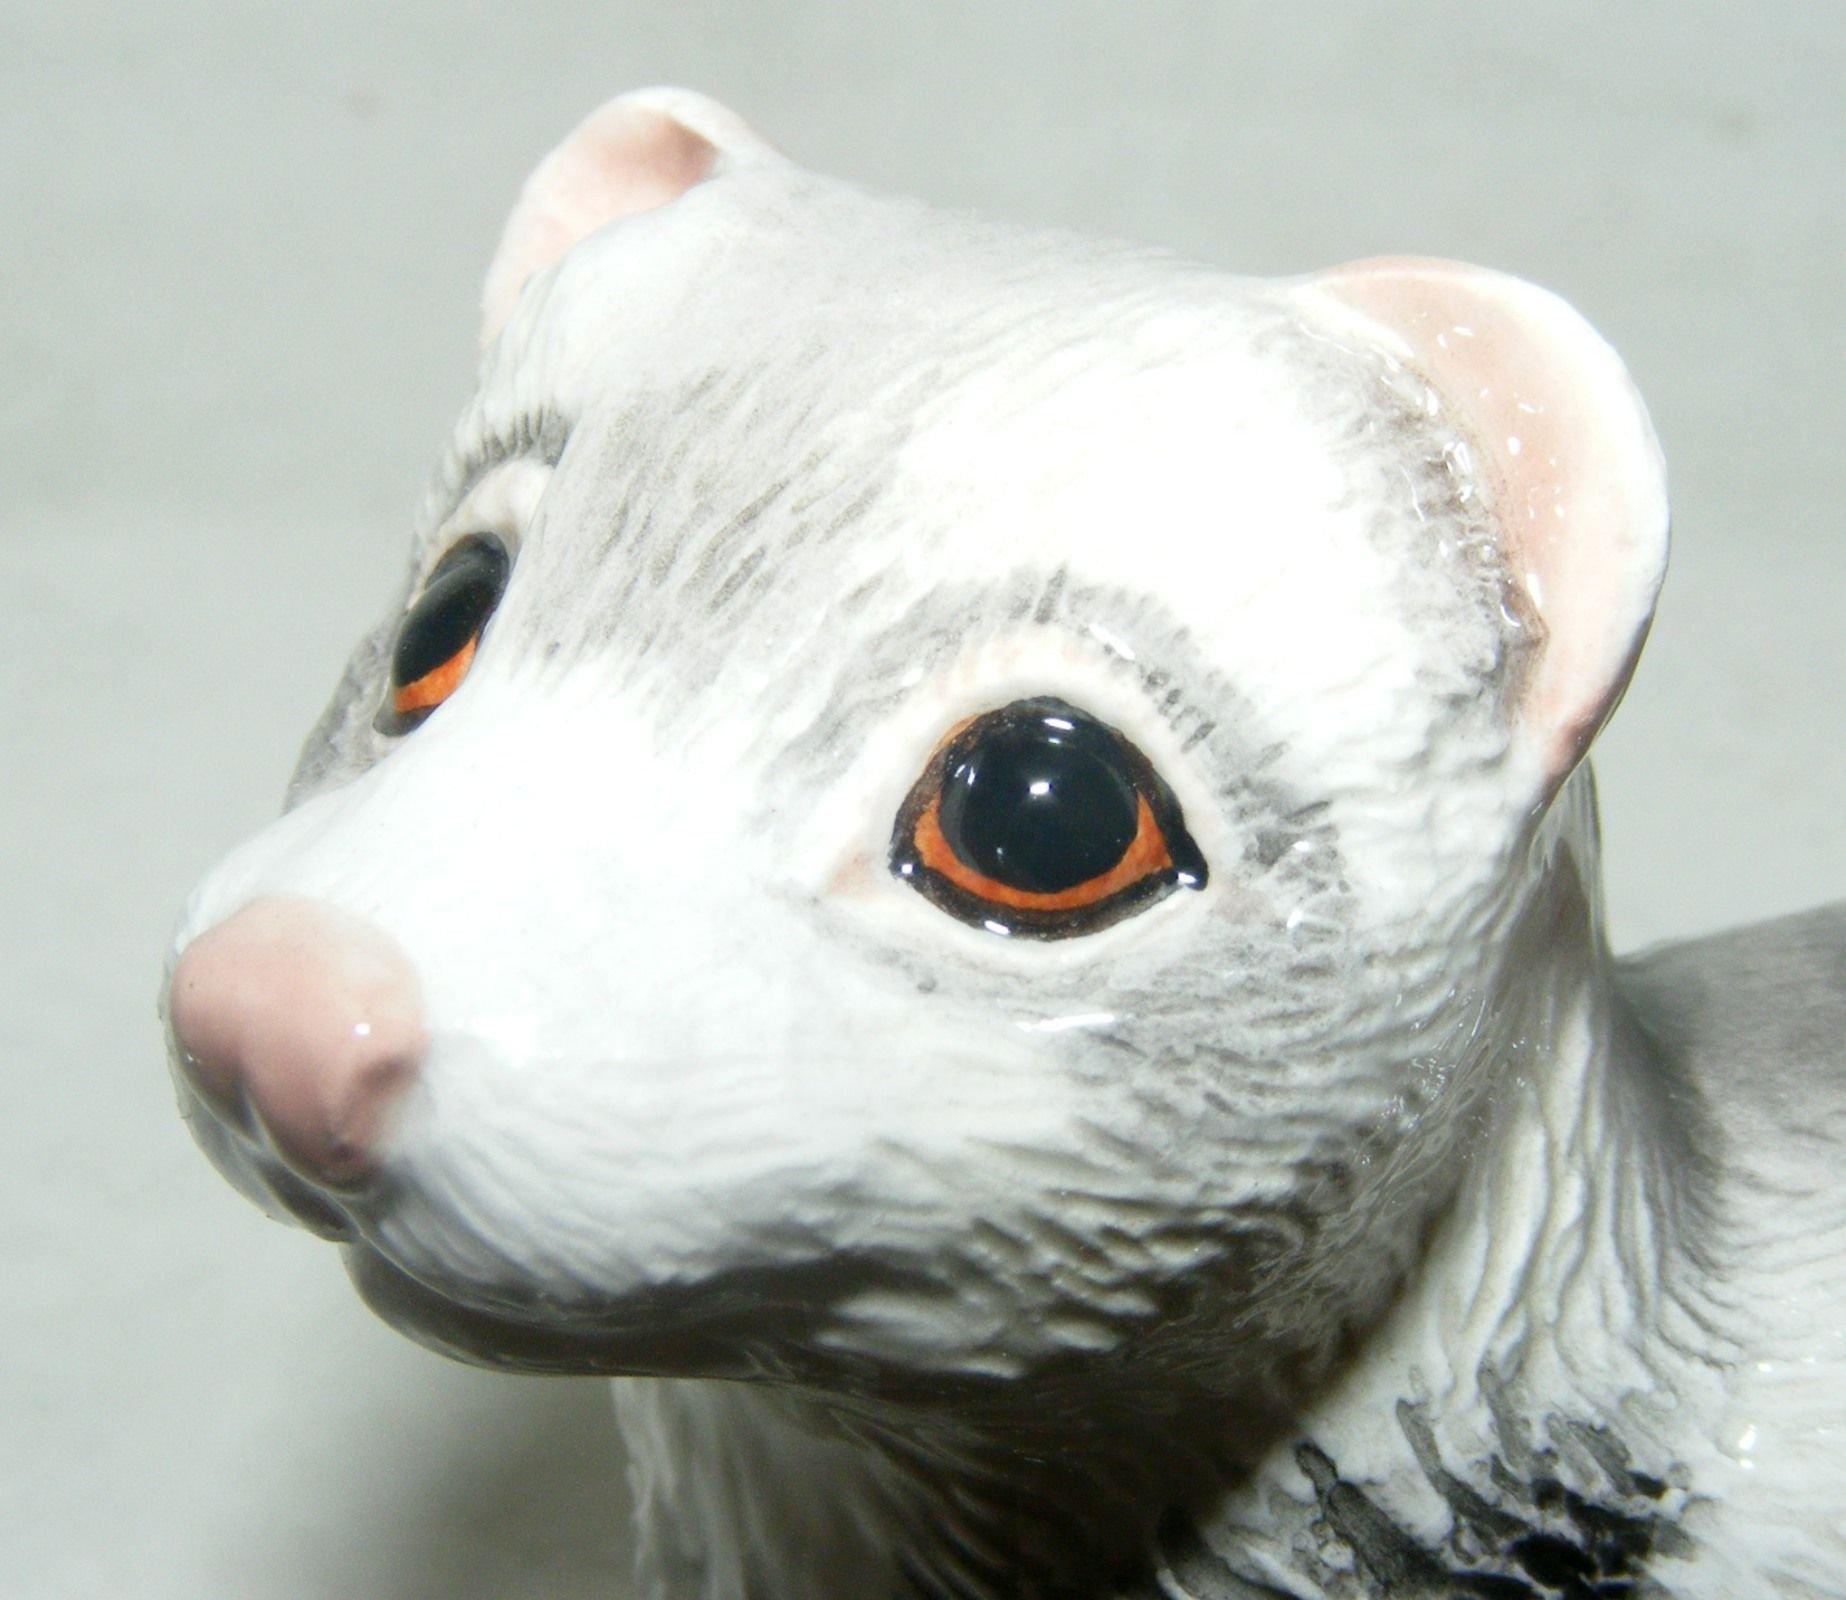 John Beswick Rspca Animal Figure The Adorables Ferret Jbts4